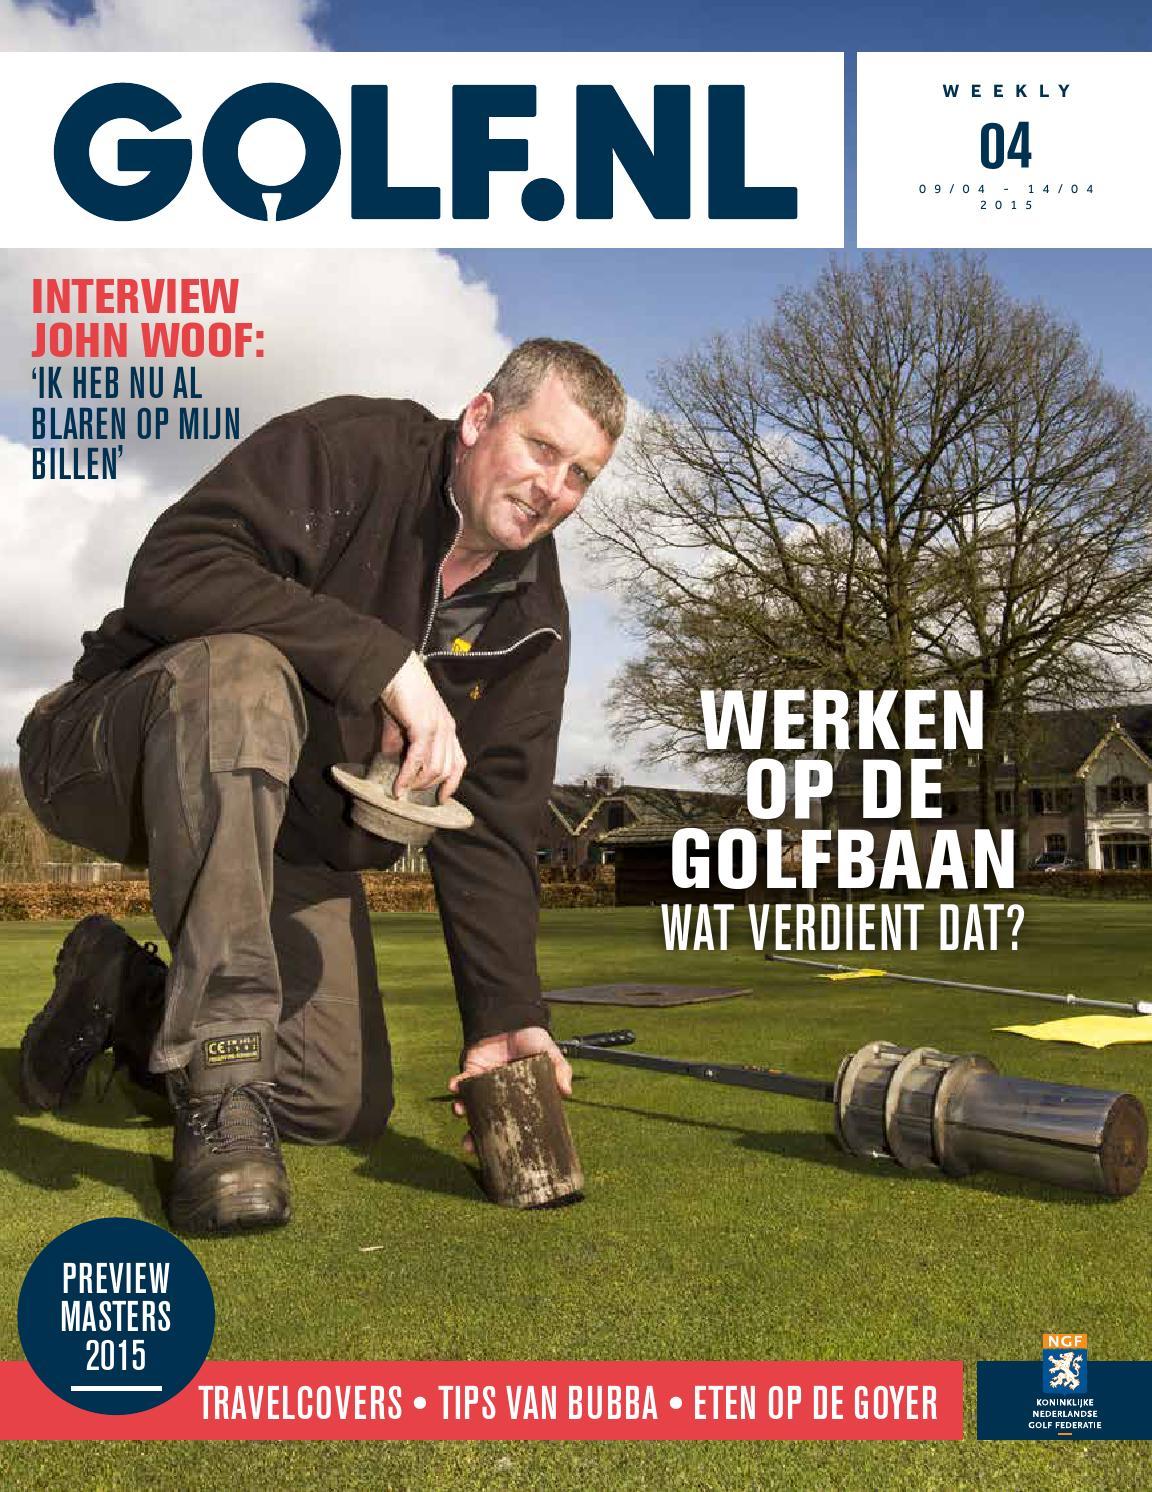 Golf.nl weekly 8 2016 by koninklijke nederlandse golf federatie ...